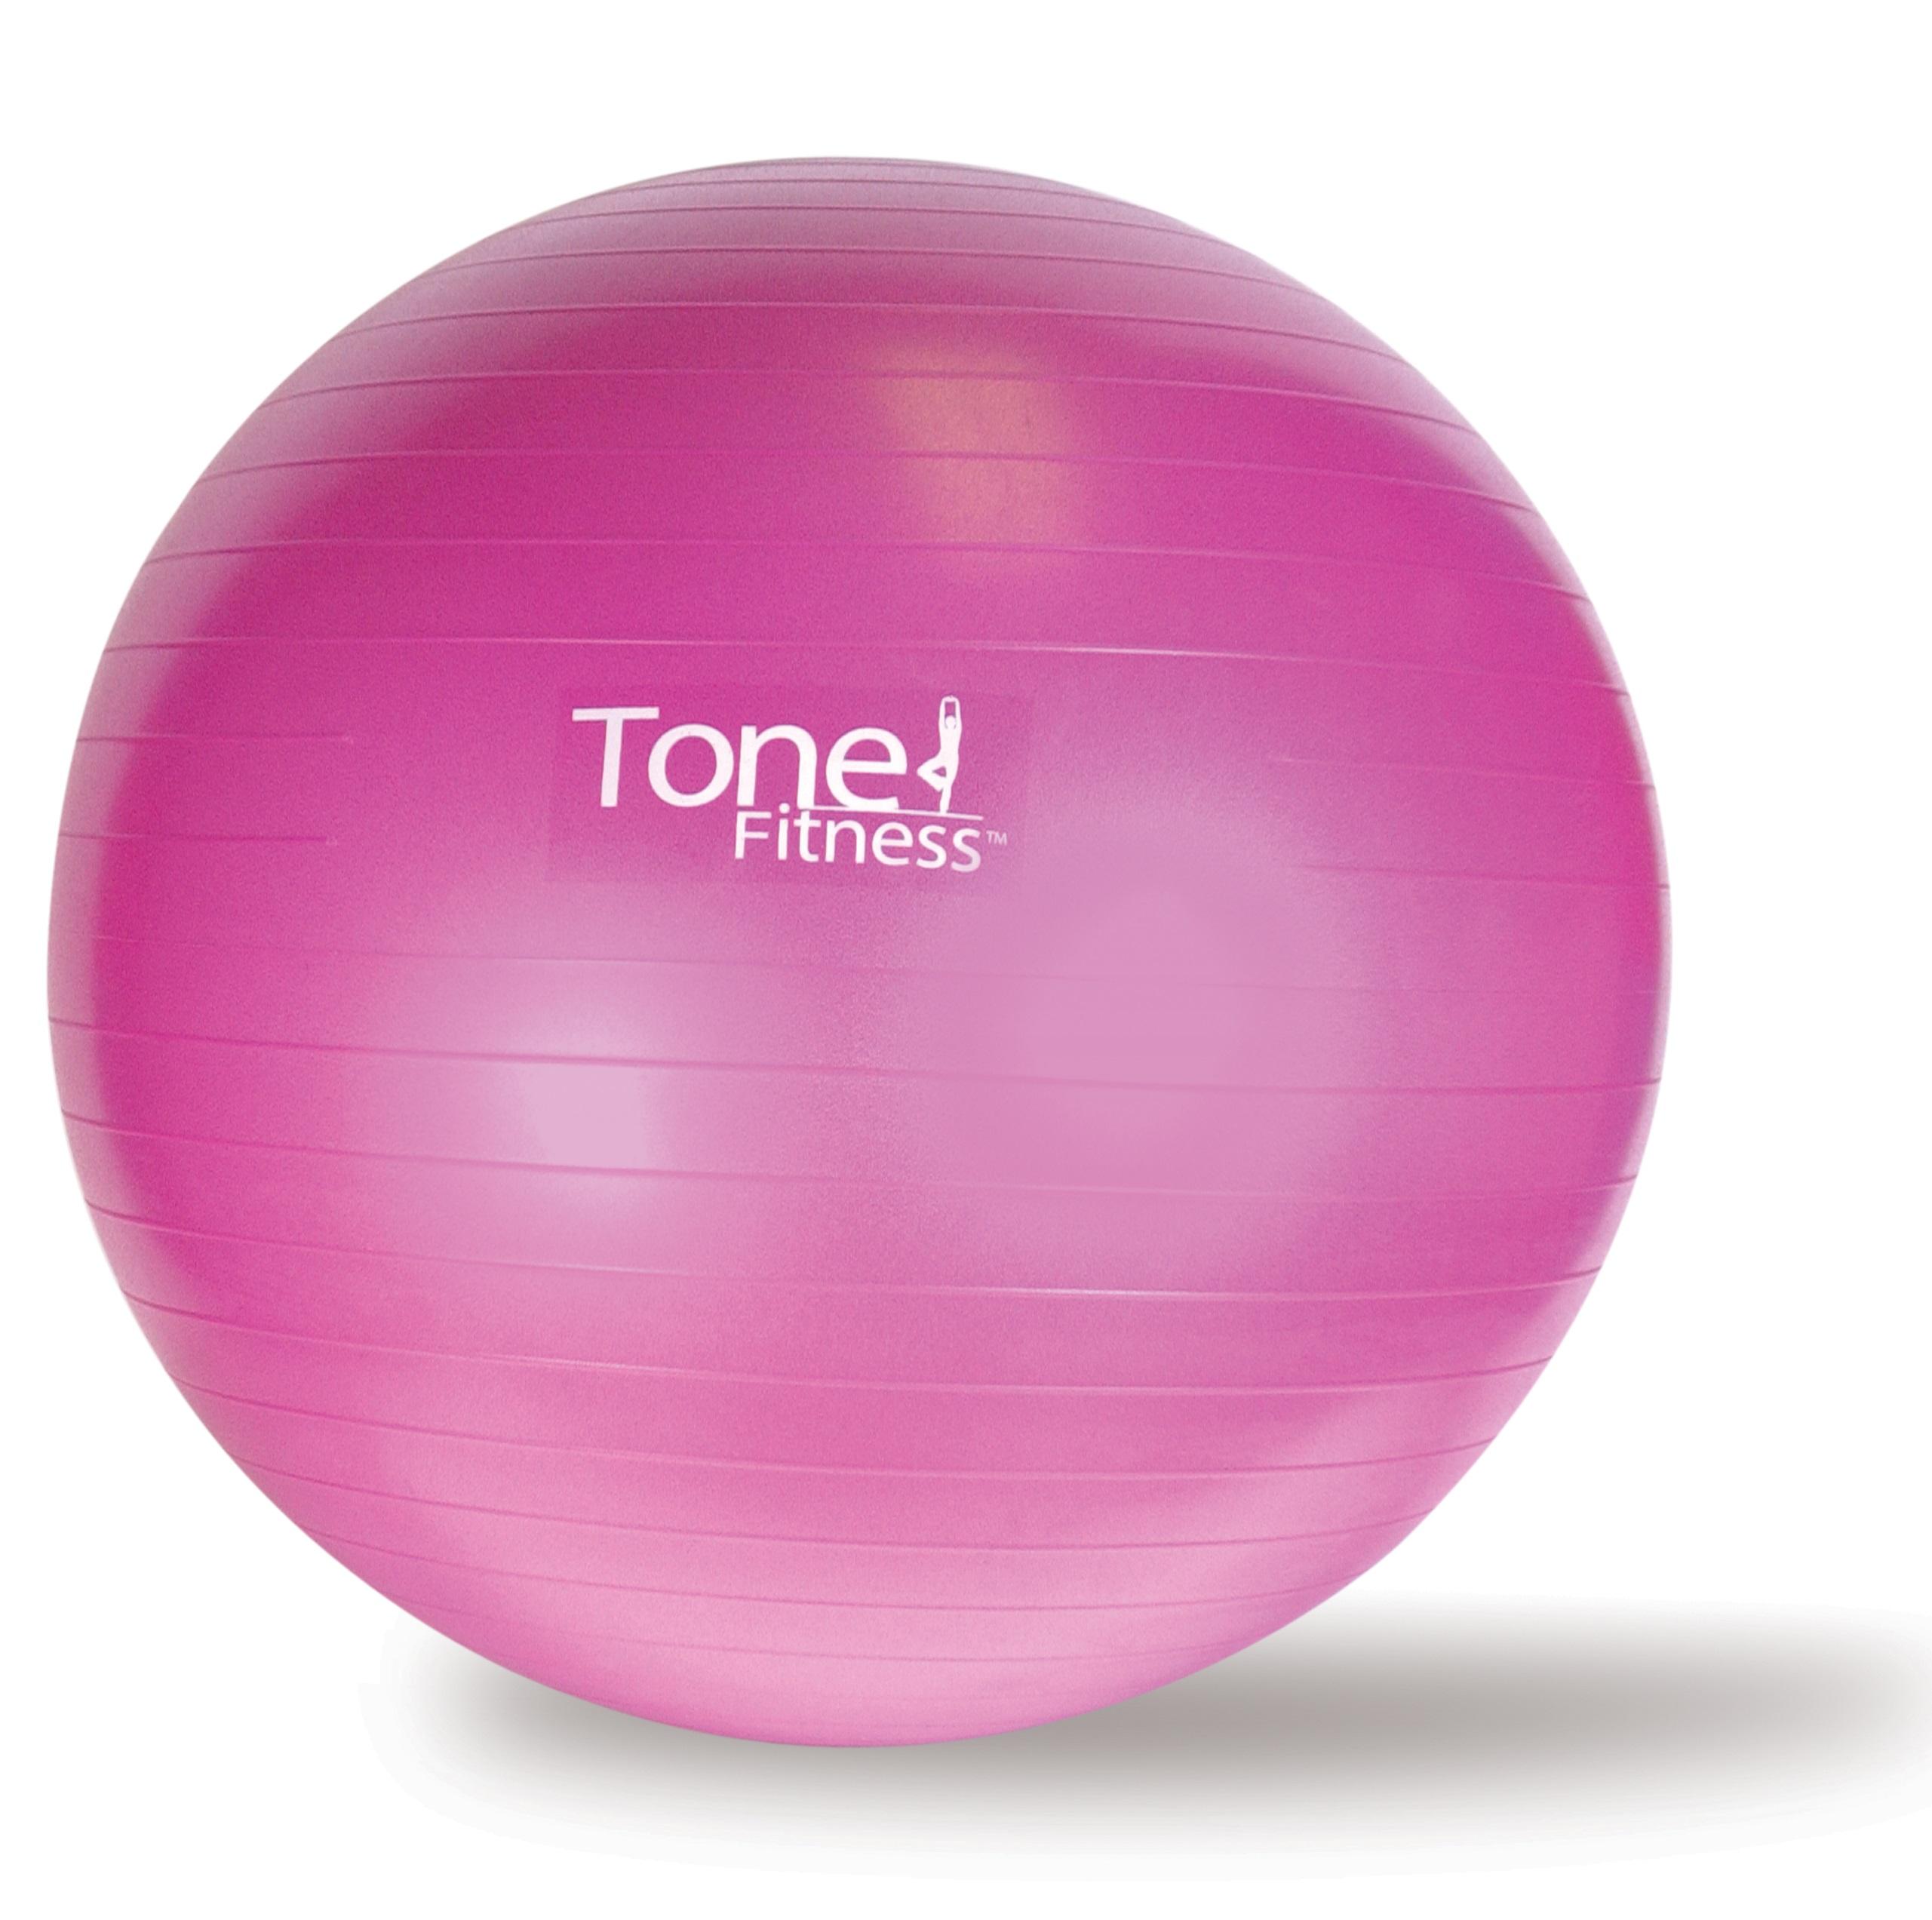 Tone Fitness Anti-burst Stability Ball, Assorted Sizes